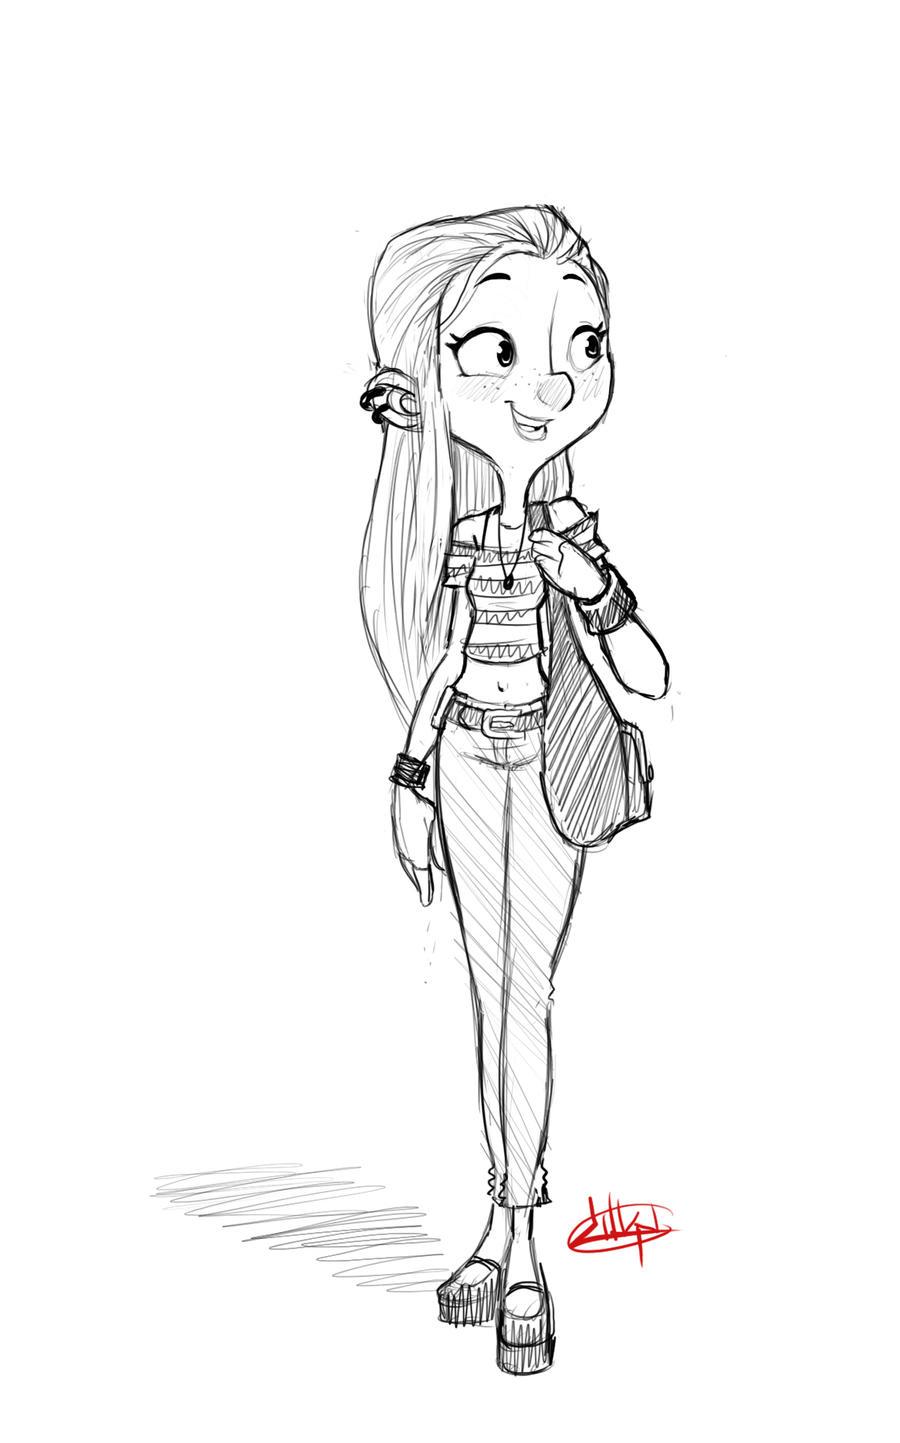 Girl A Day 15 by LuigiL